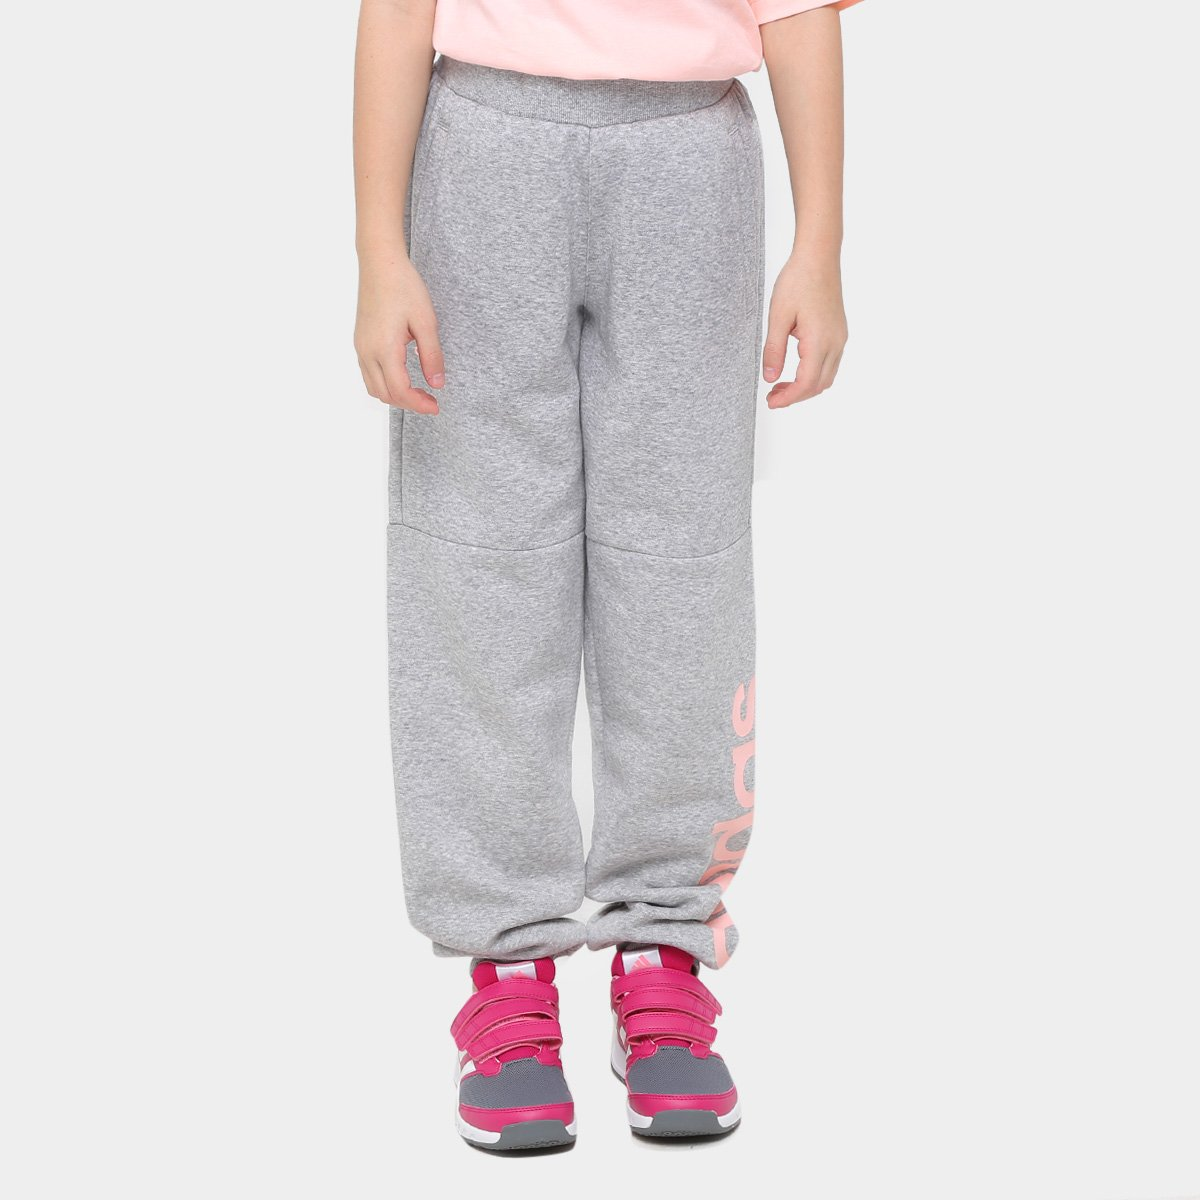 de6db17a12 Calça Adidas Lk Lin Sweat Pants Infantil